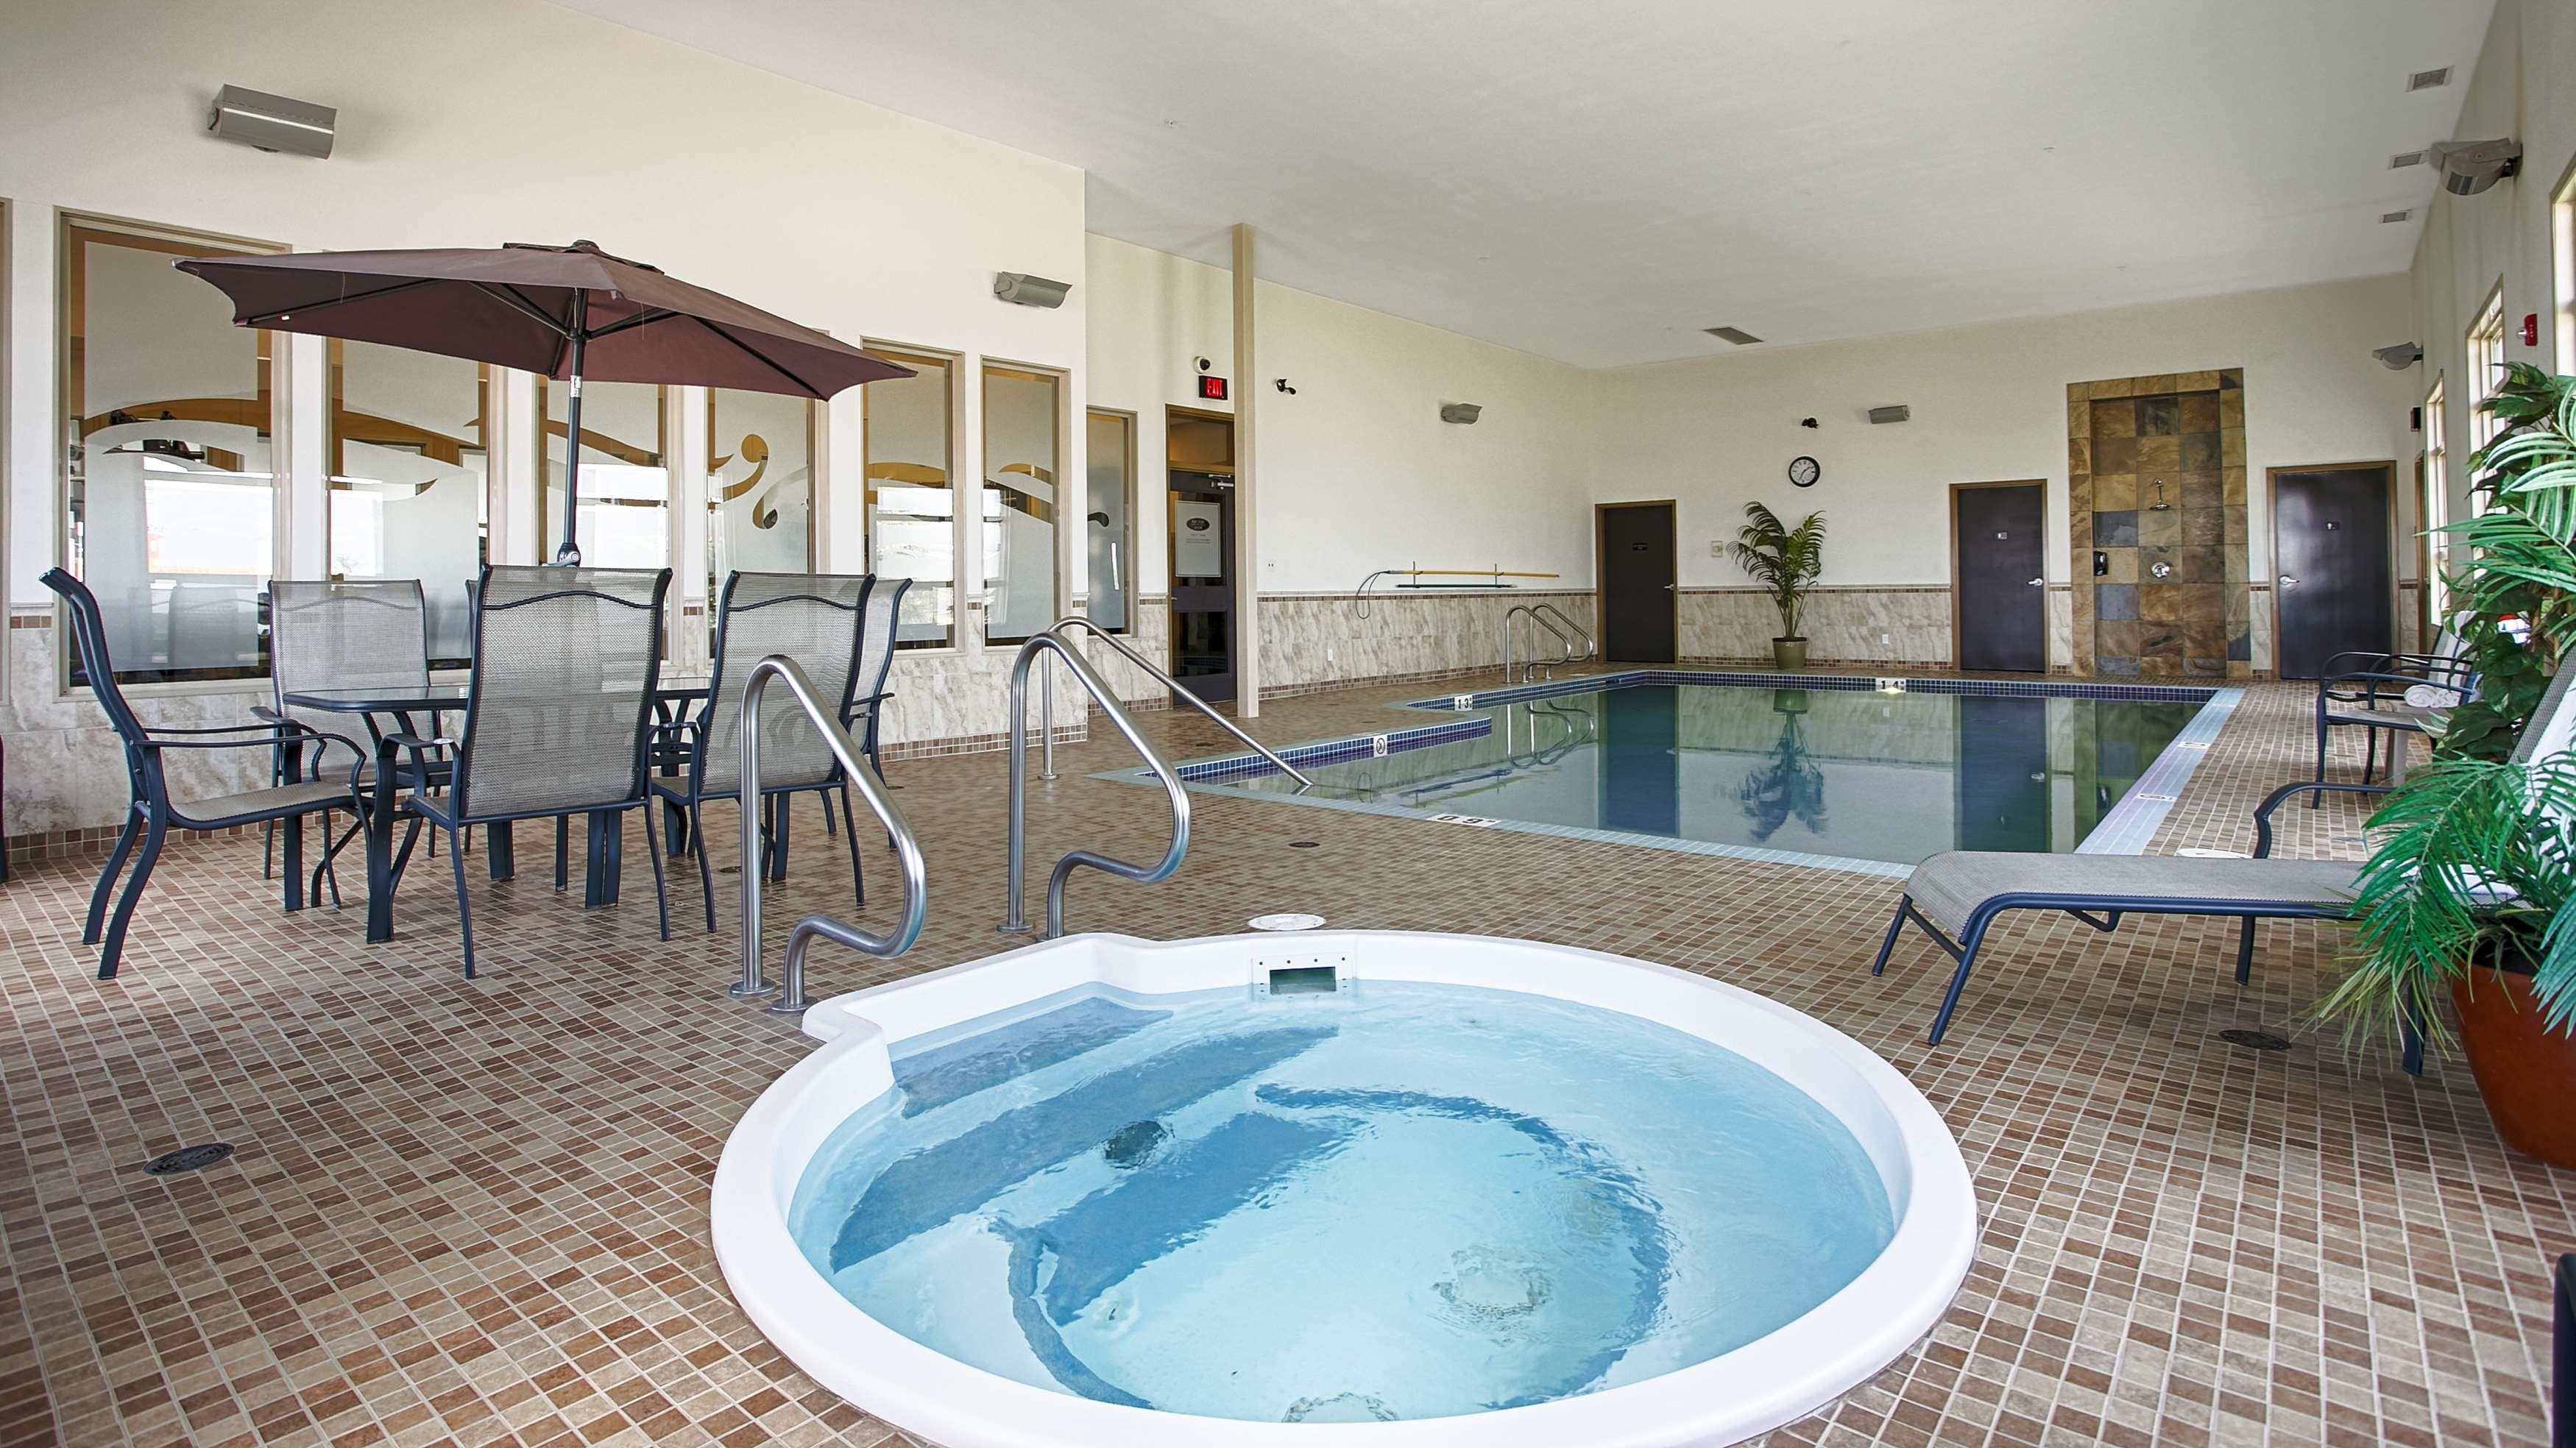 Hot Tub Best Western Wainwright Inn & Suites Wainwright (780)845-9934